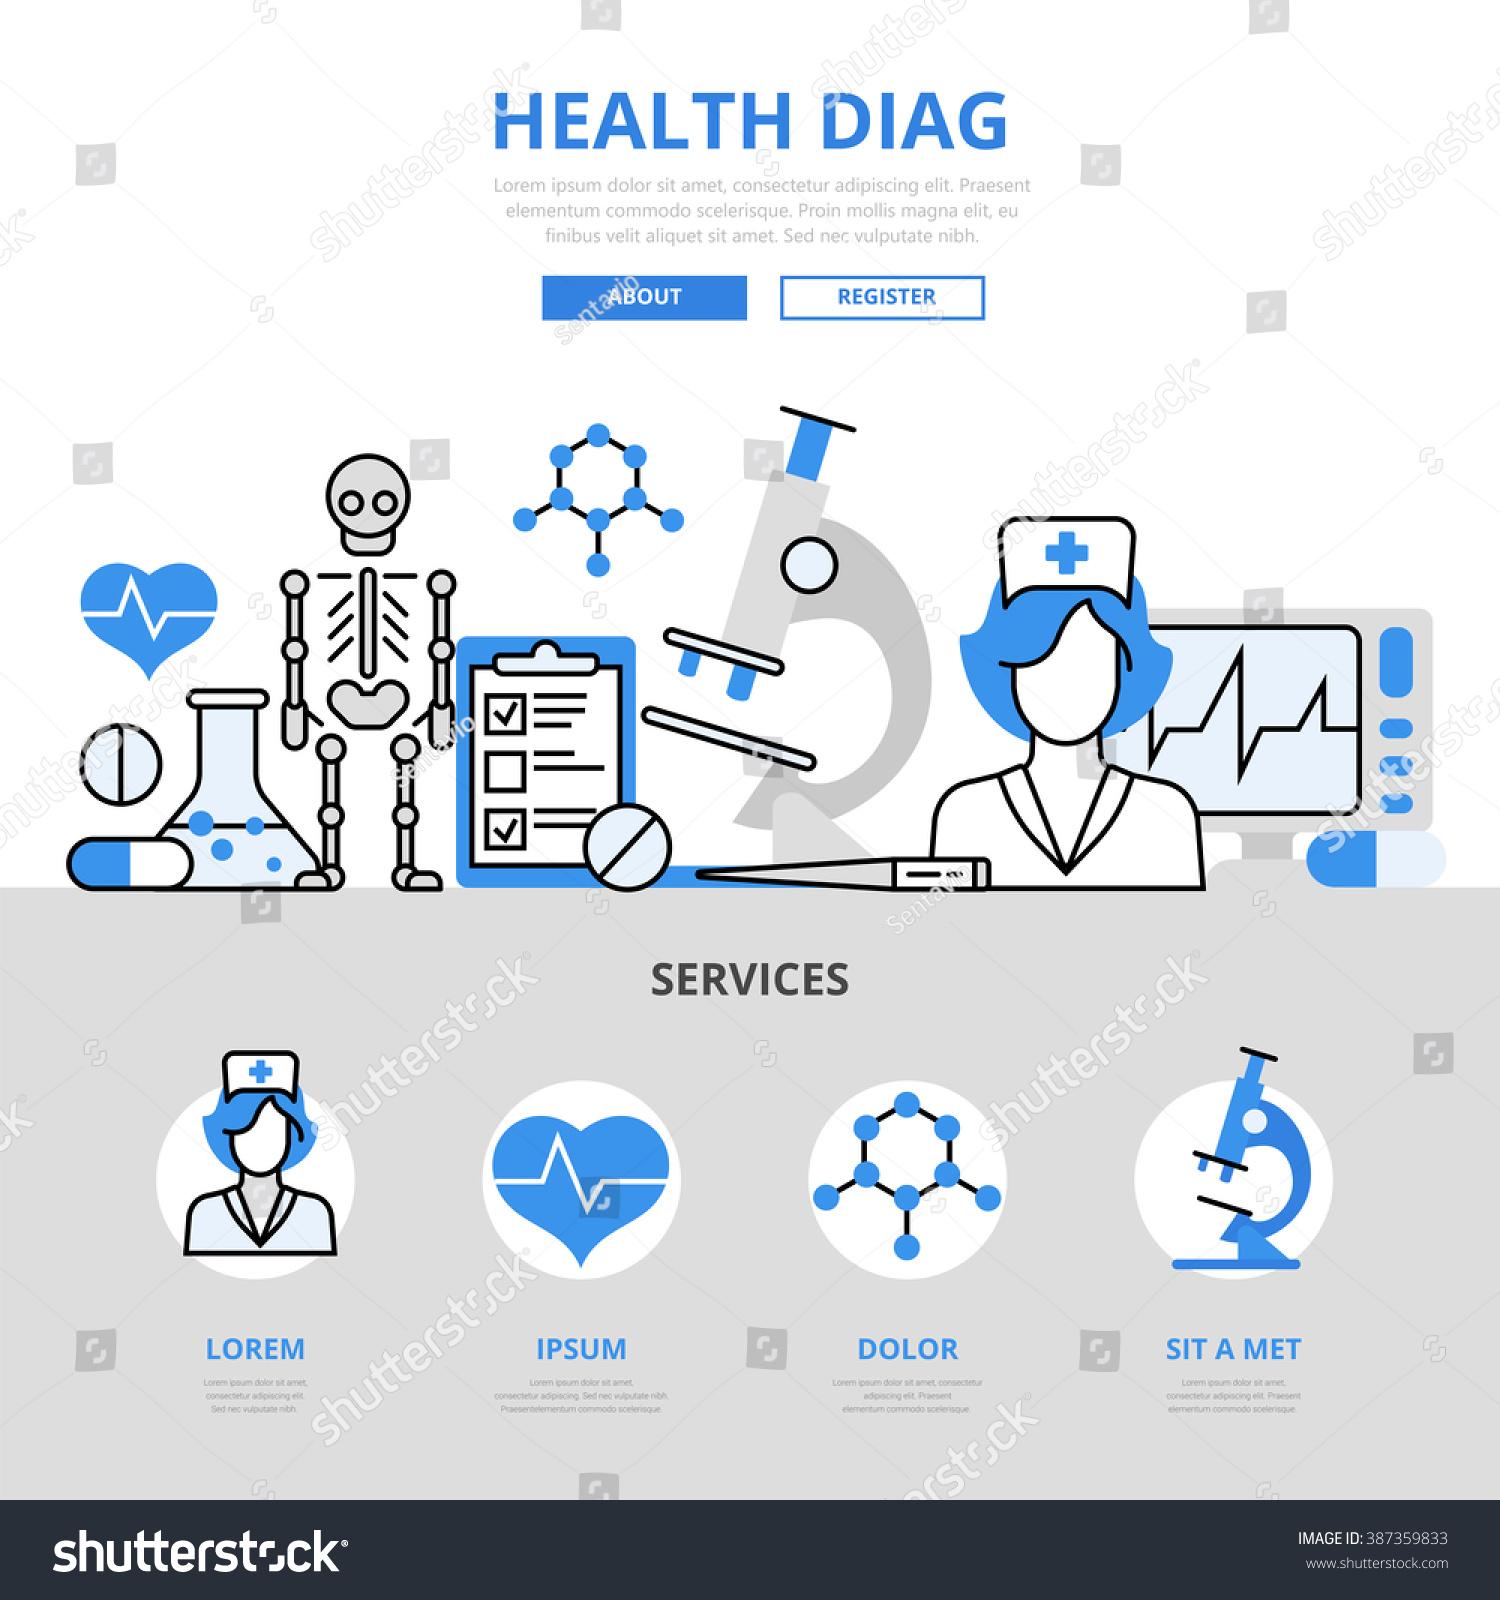 Health Checkup Medical Diagnostics Laboratory Lab Test